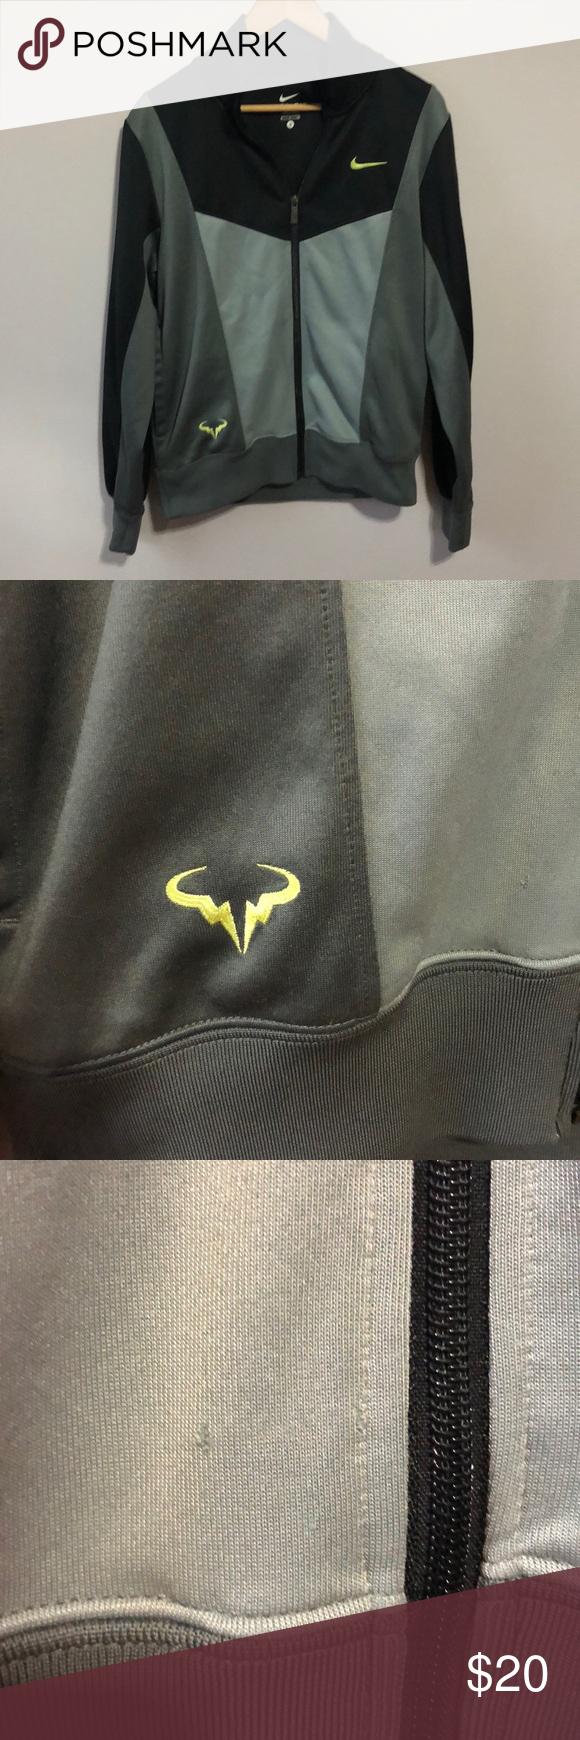 c7cdd3ade1eb Nike Dri-Fit Men s Small Black Gray Track Jacket EUC Nike Track Jacket. Only